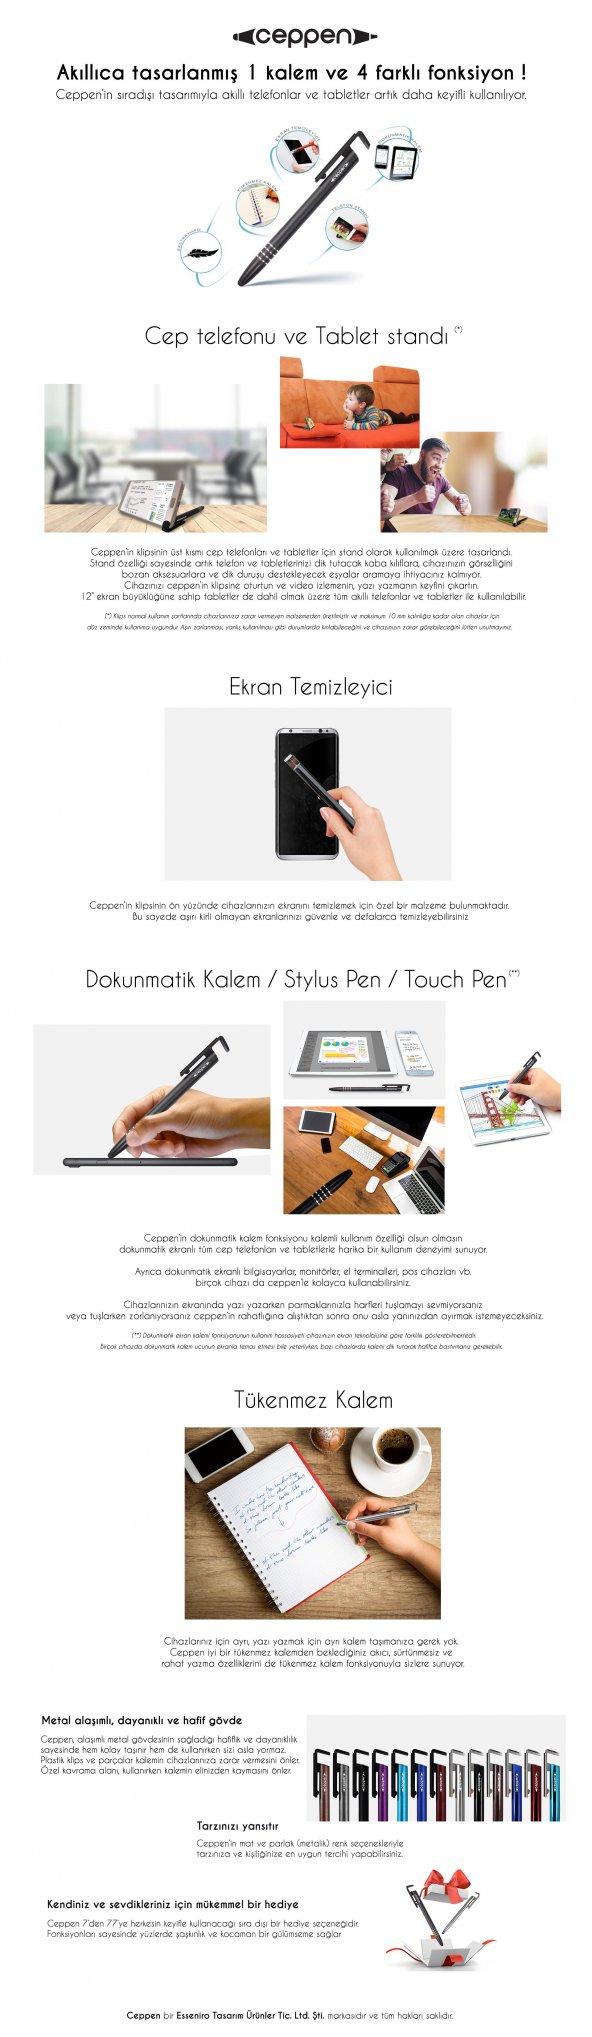 Ceppen Telefon ve Tablet Standı